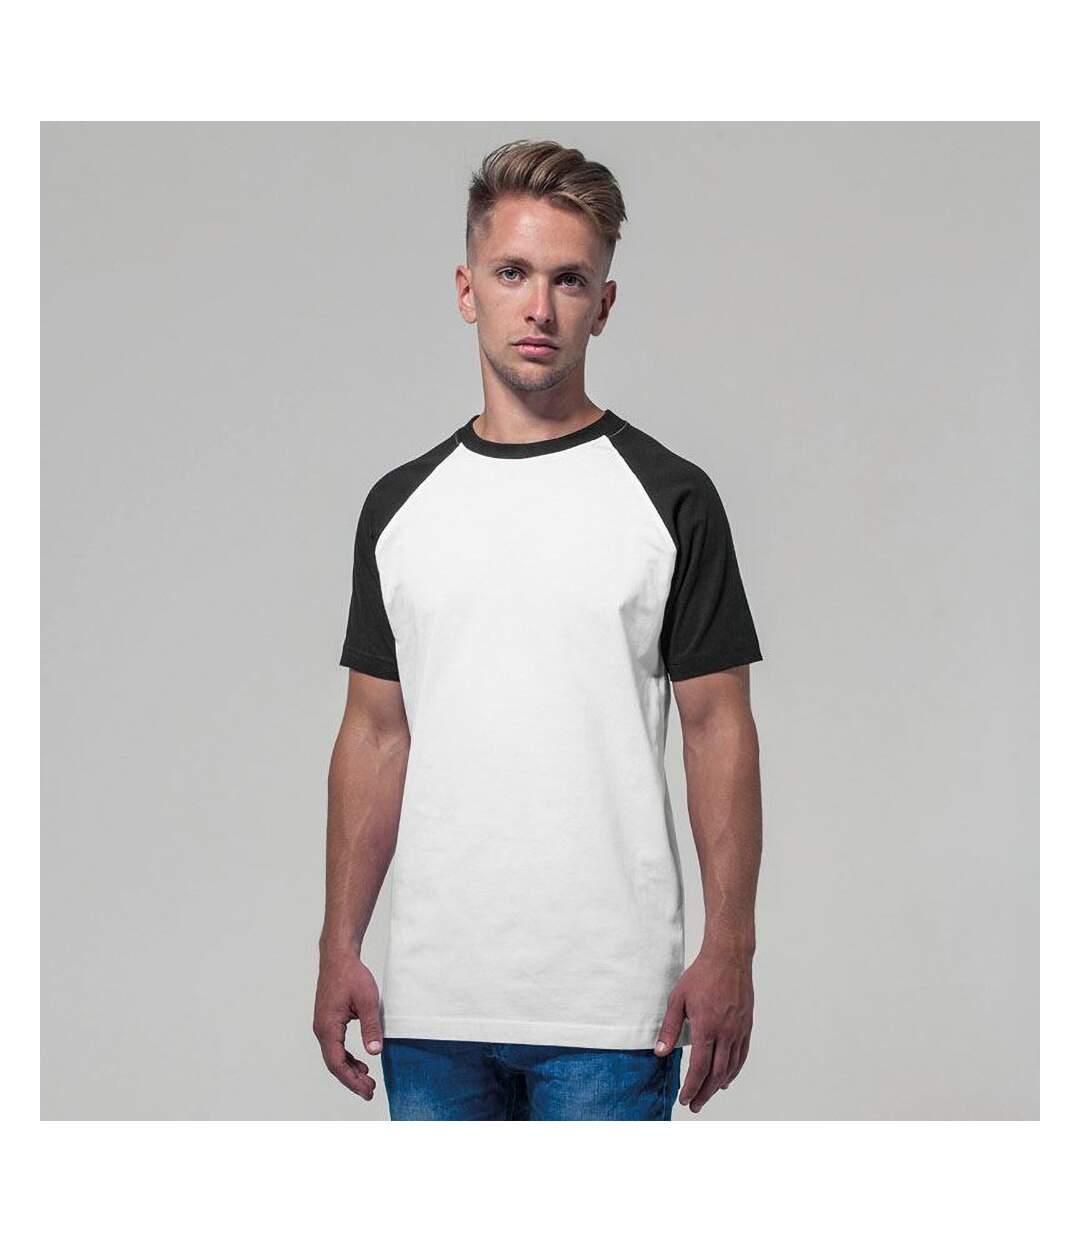 Build Your Brand Mens Raglan Contrast Short Sleeve T-Shirt (White/Black) - UTRW5683